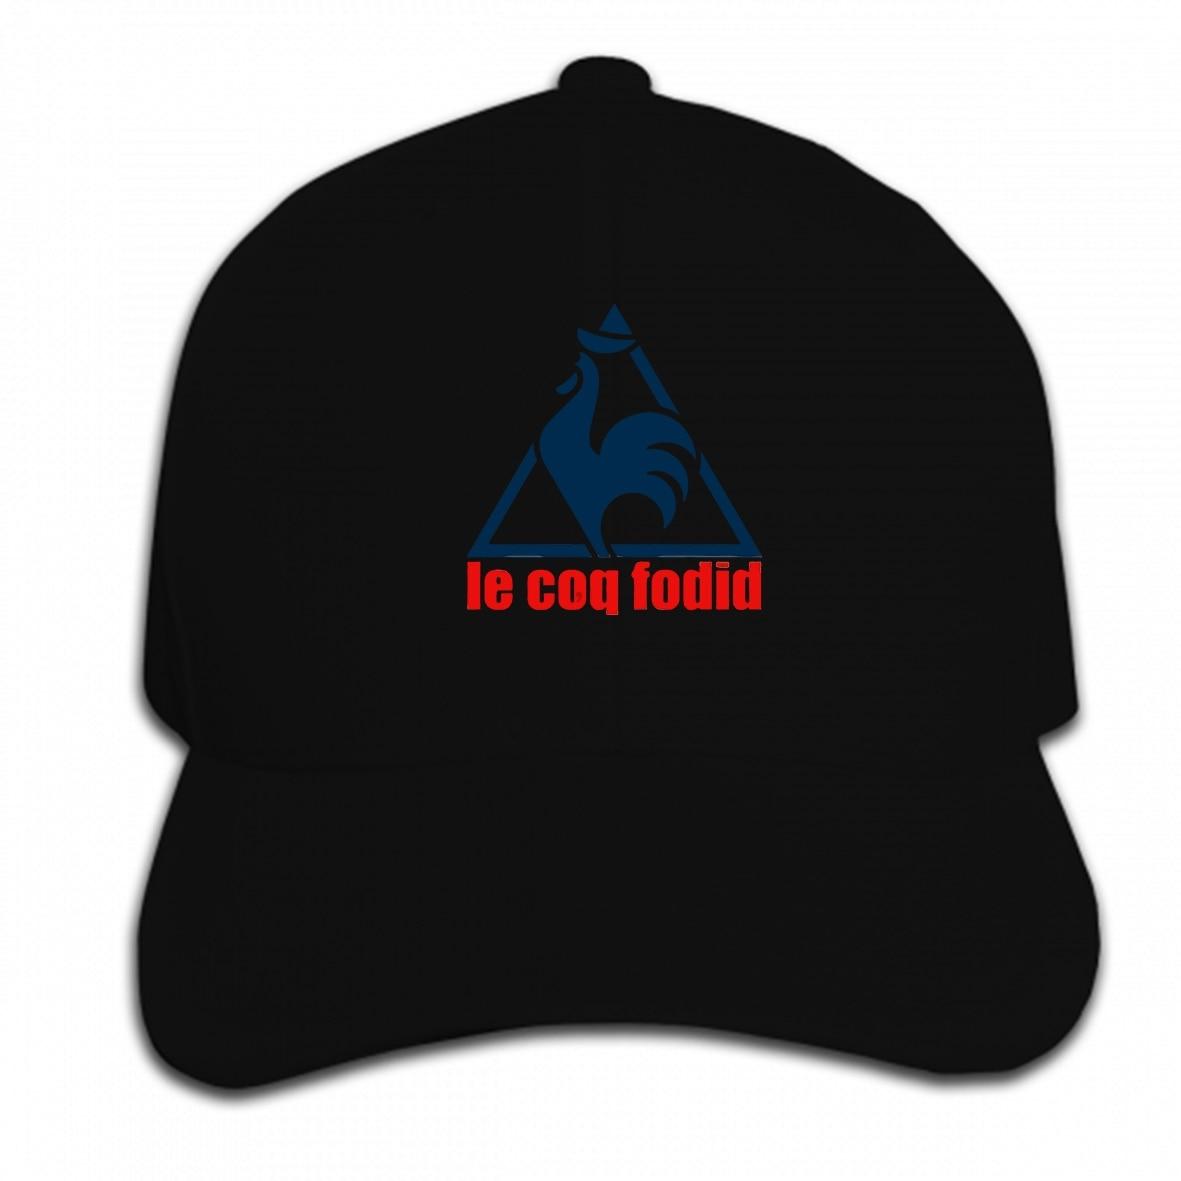 Print Custom Baseball Cap Le Coq Fodid Mens Casual Funny  Hat Peaked Cap